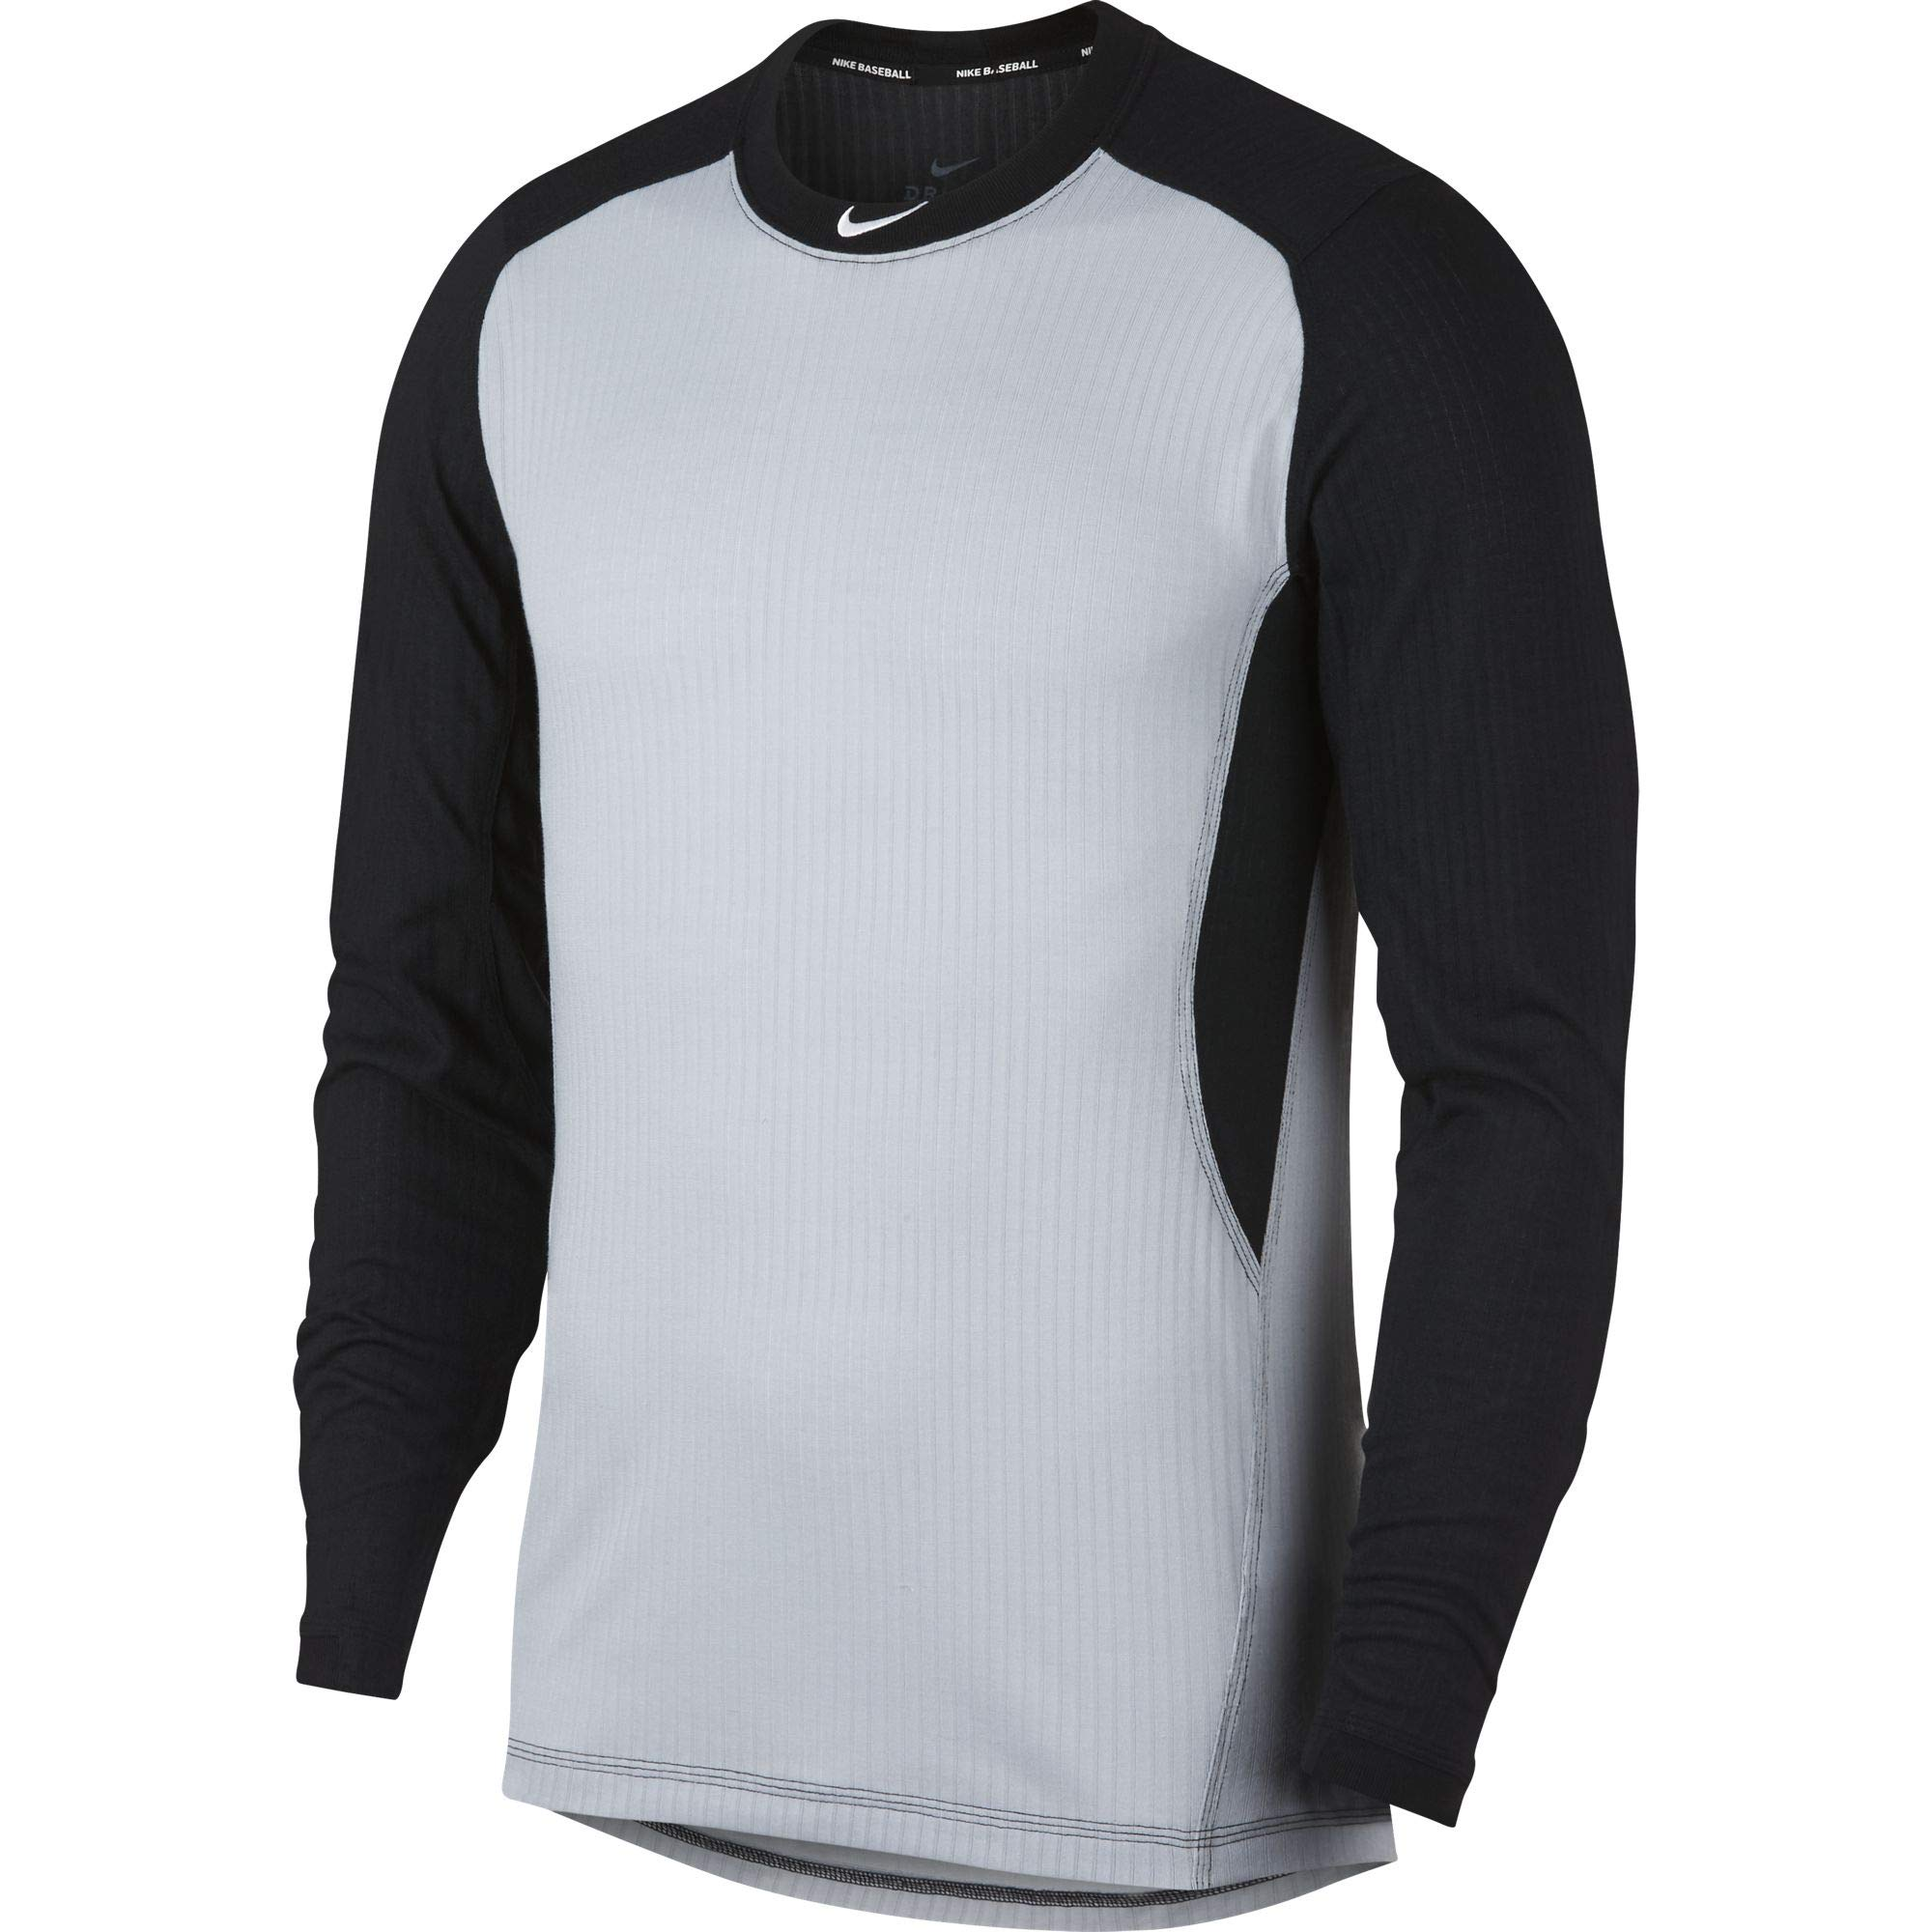 Nike Men's Long Sleeve Baseball Top Wolf Grey/Black/White Size Medium